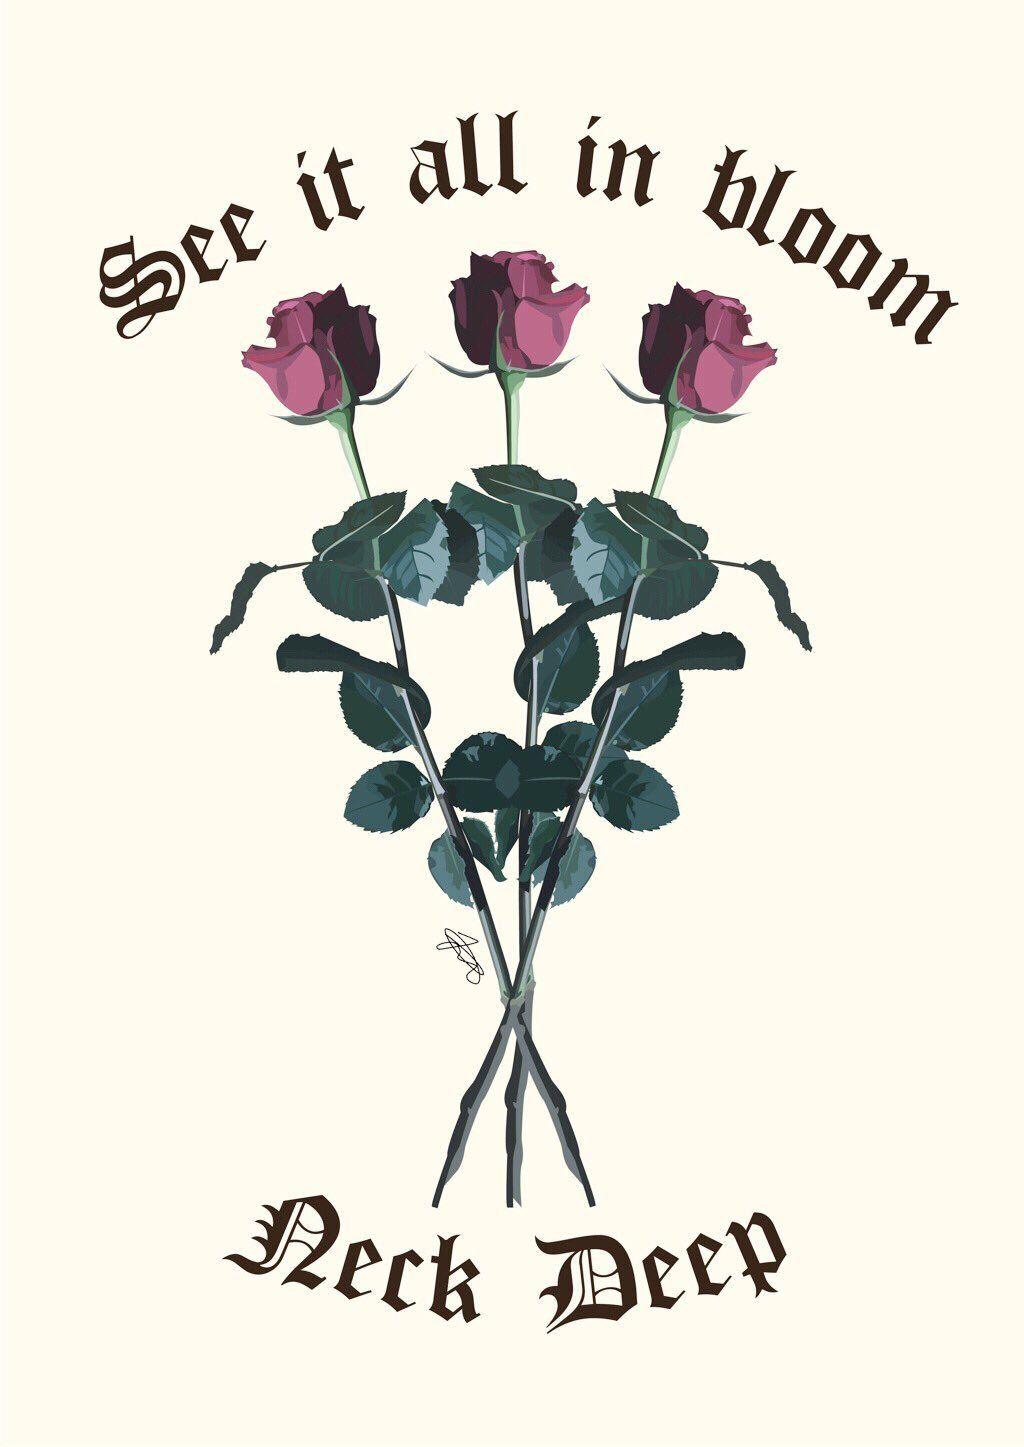 Neck Deep - In Bloom | Neck deep lyrics, Pop punk lyrics, Blink 182 lyrics